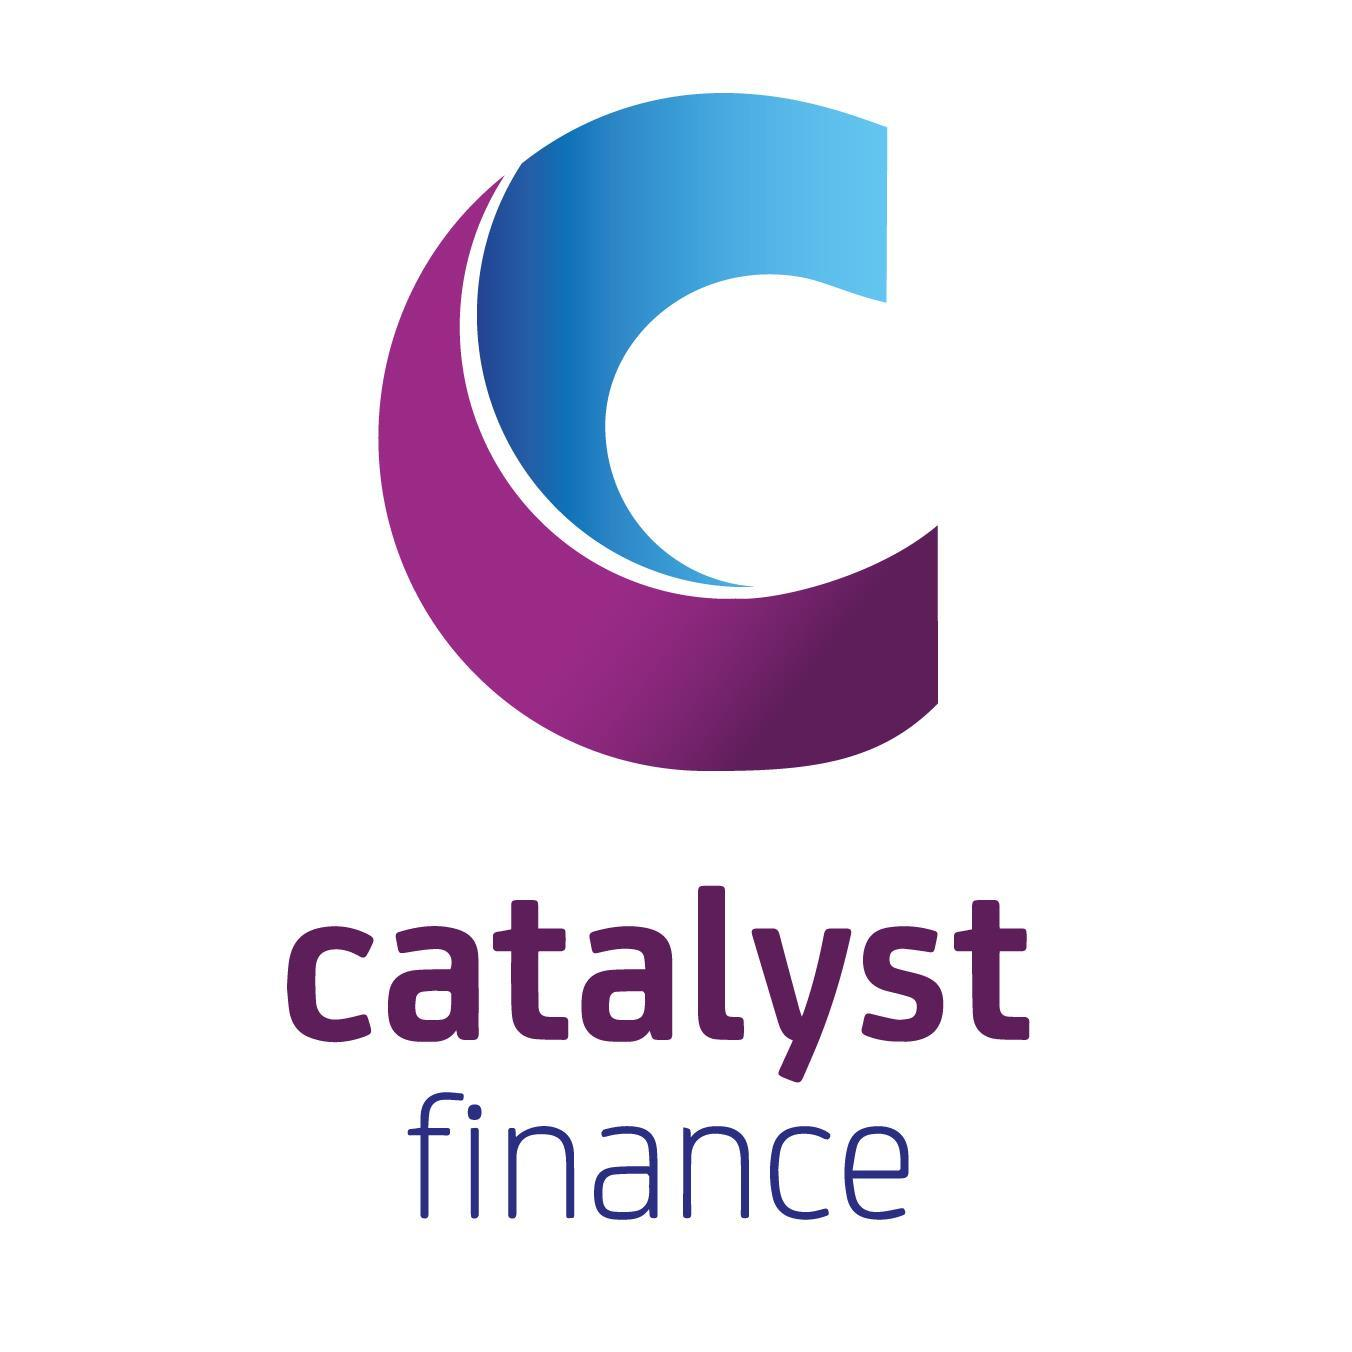 Catalyst Finance